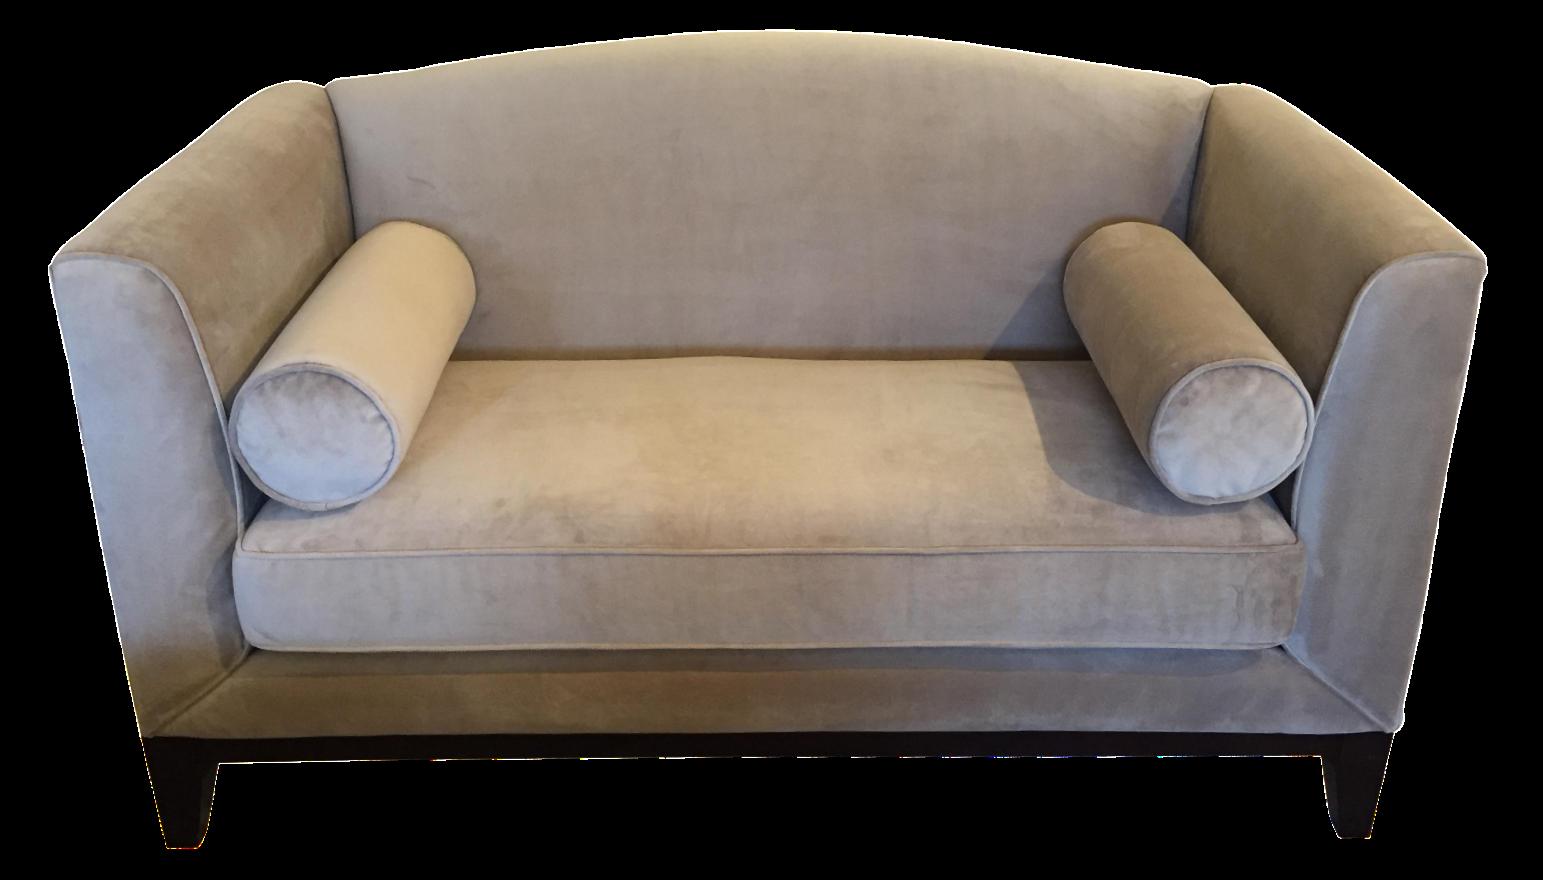 Decor Rest Furniture Taupe Sofa